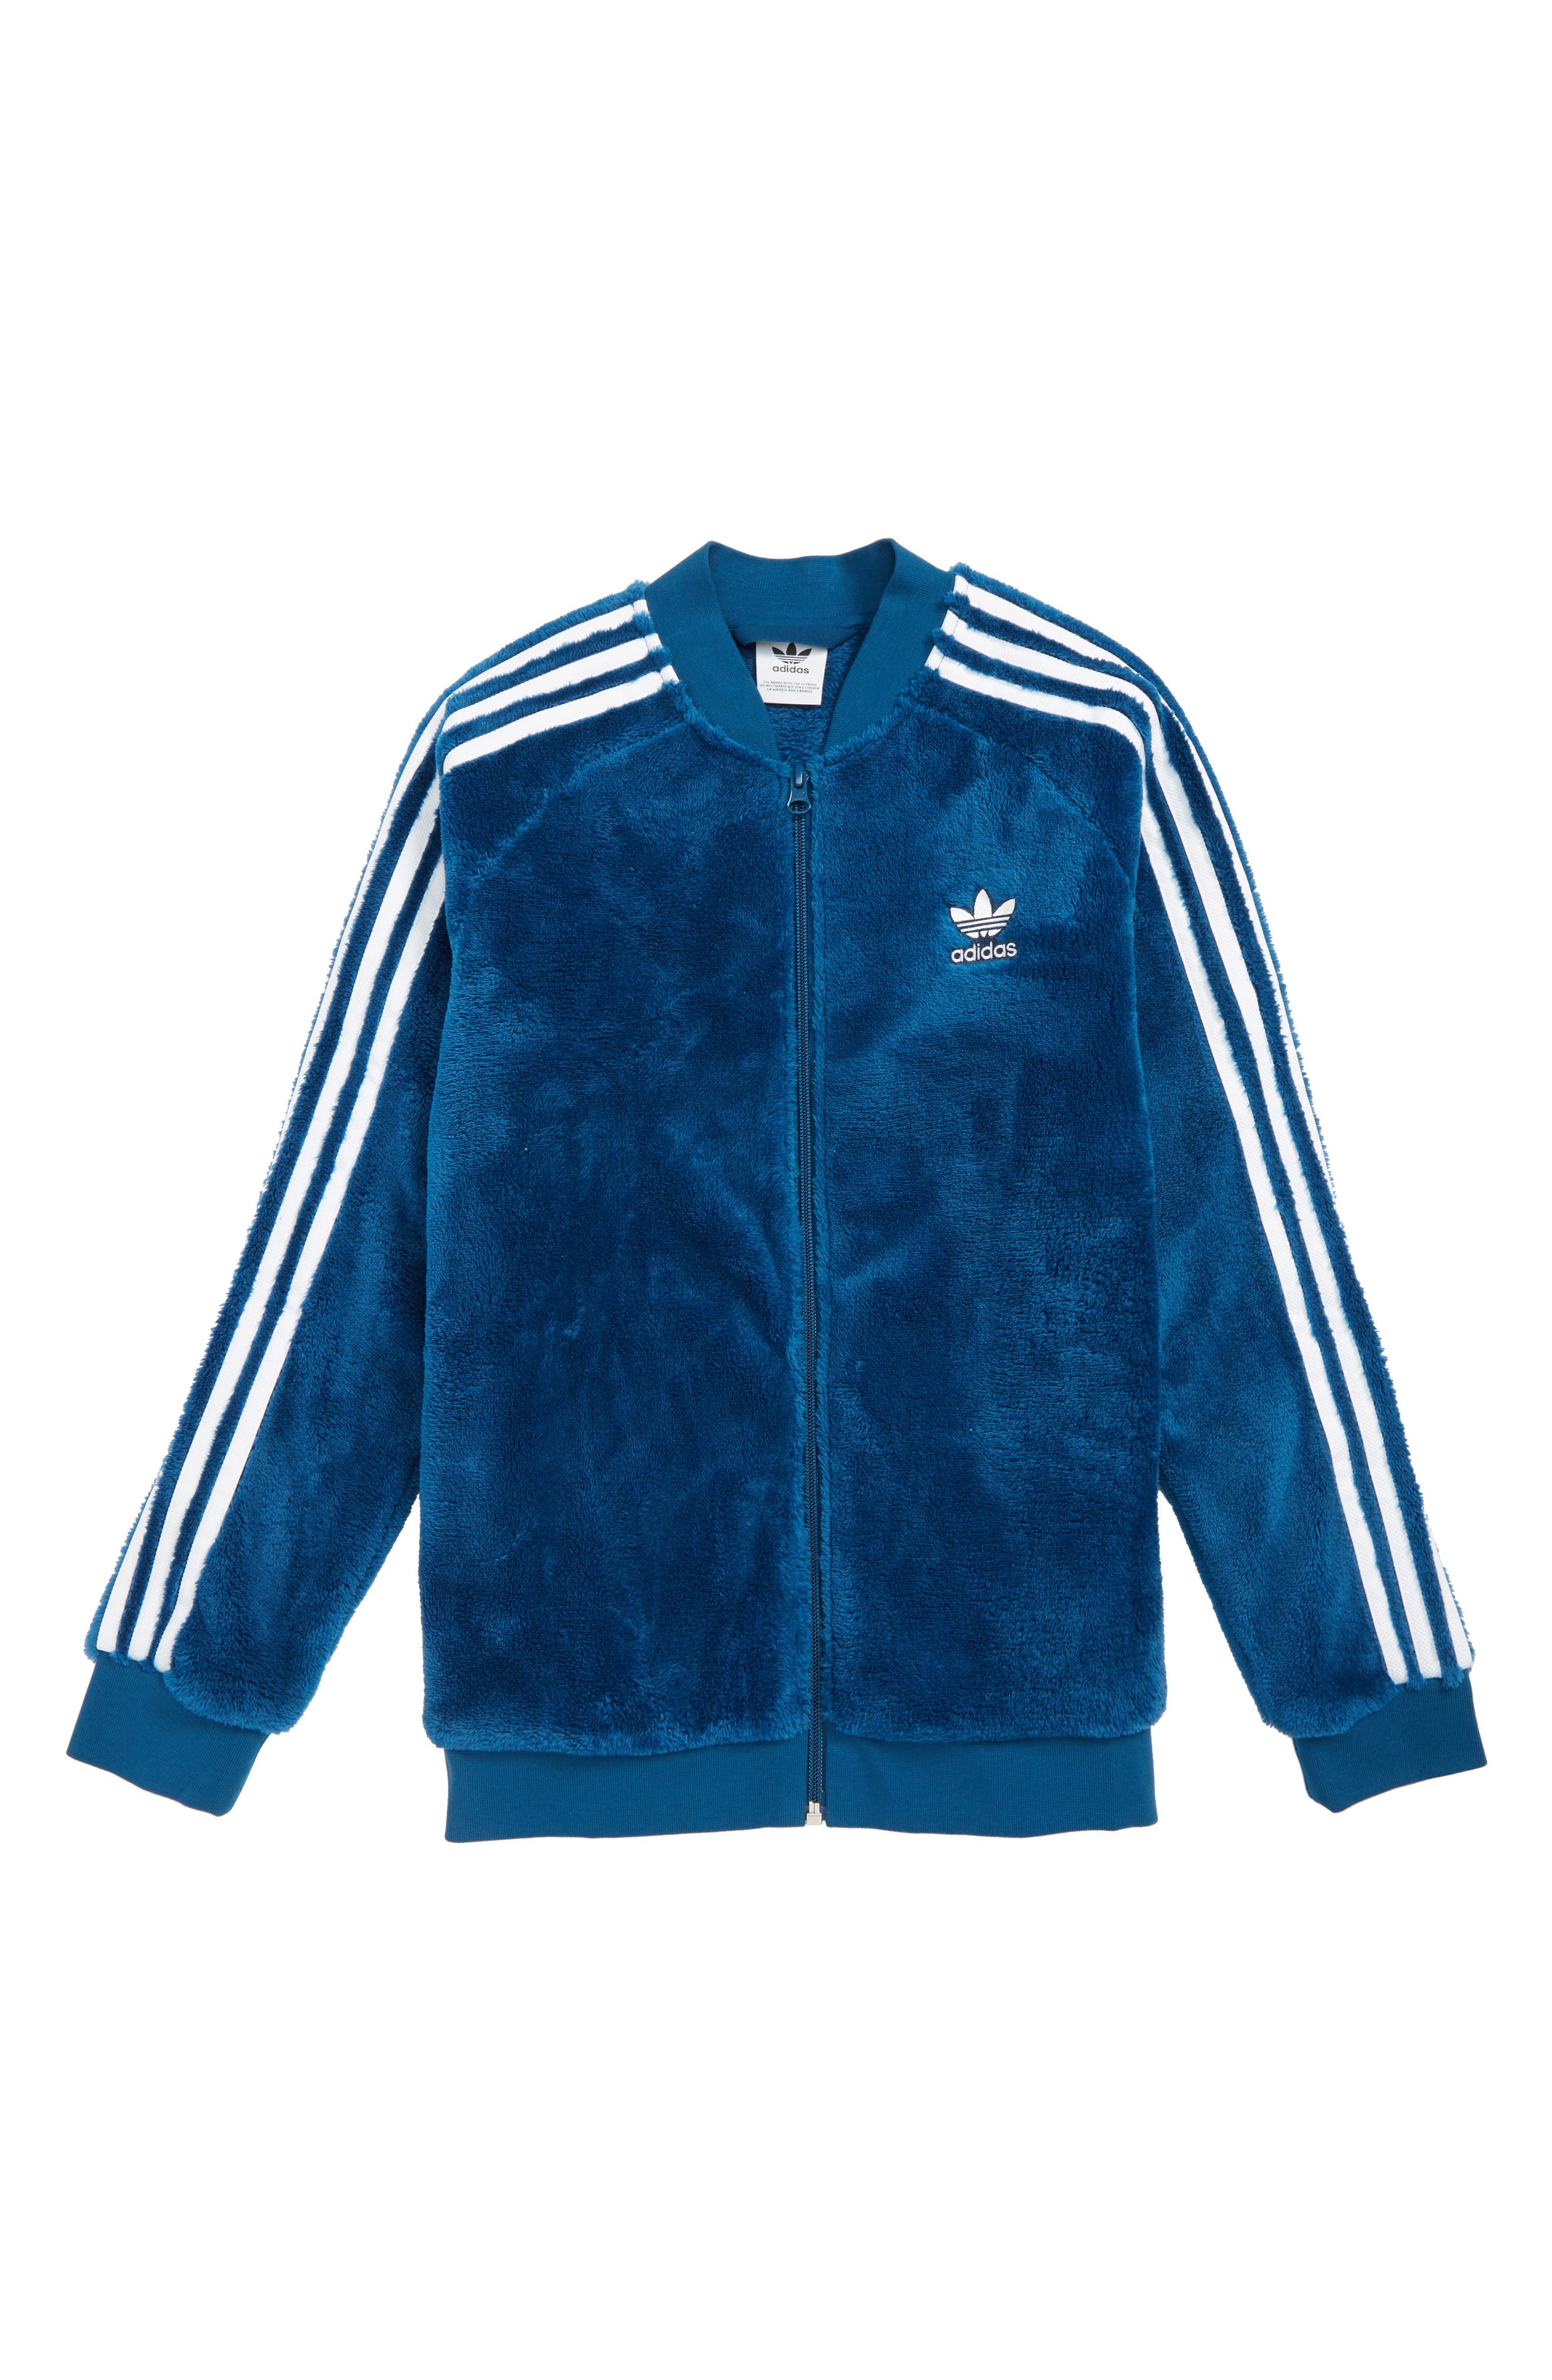 ADIDAS ORIGINALS Winter SST Jacket, Main, color, LEGEND MARINE/ WHITE